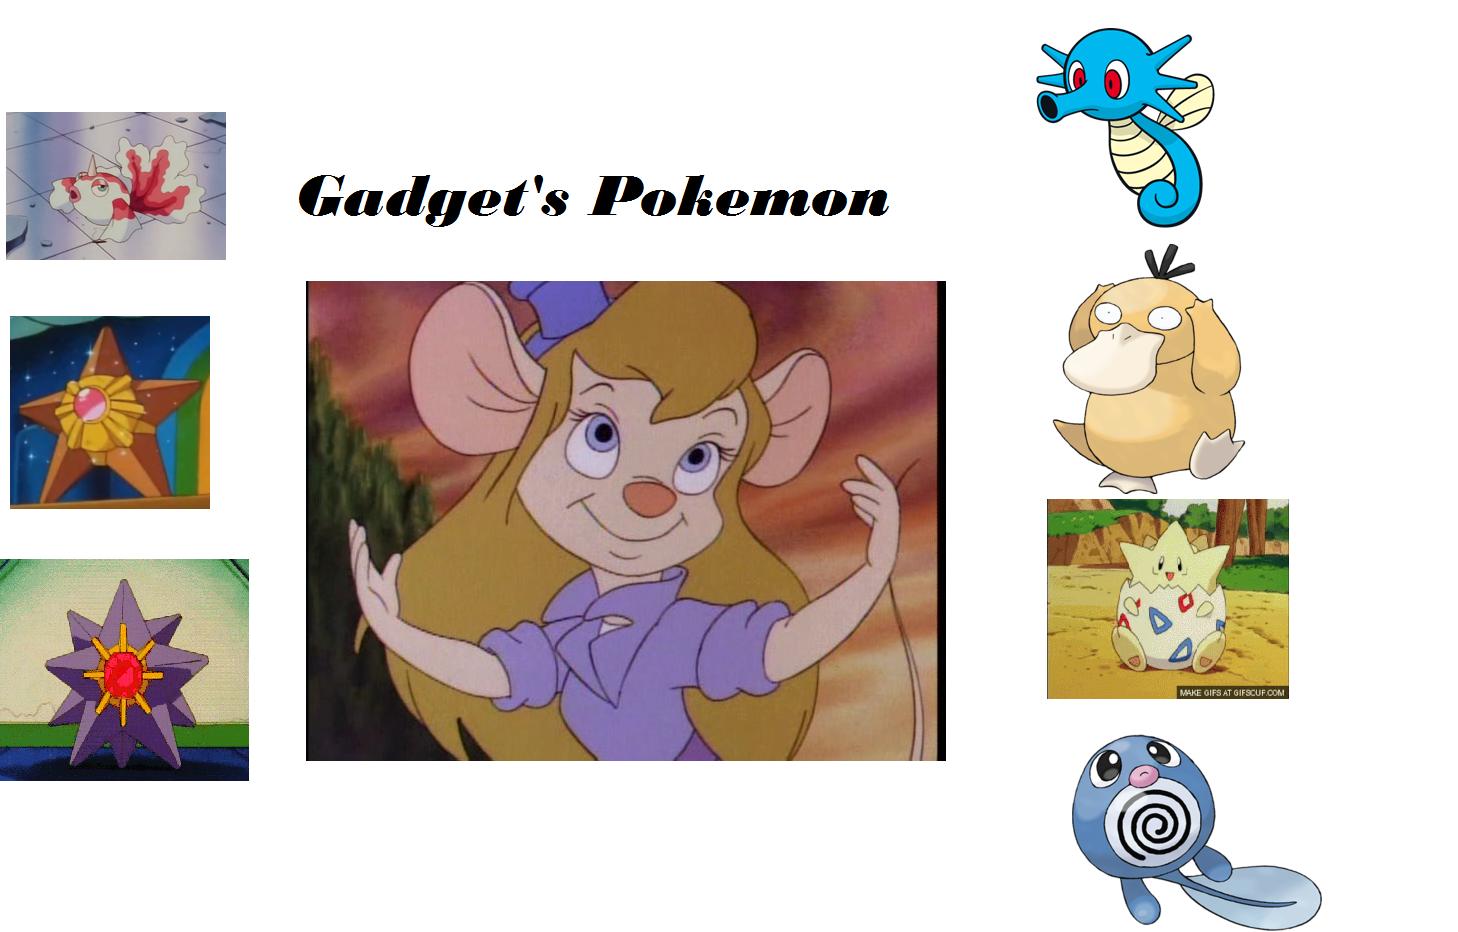 Gadget's Pokemon